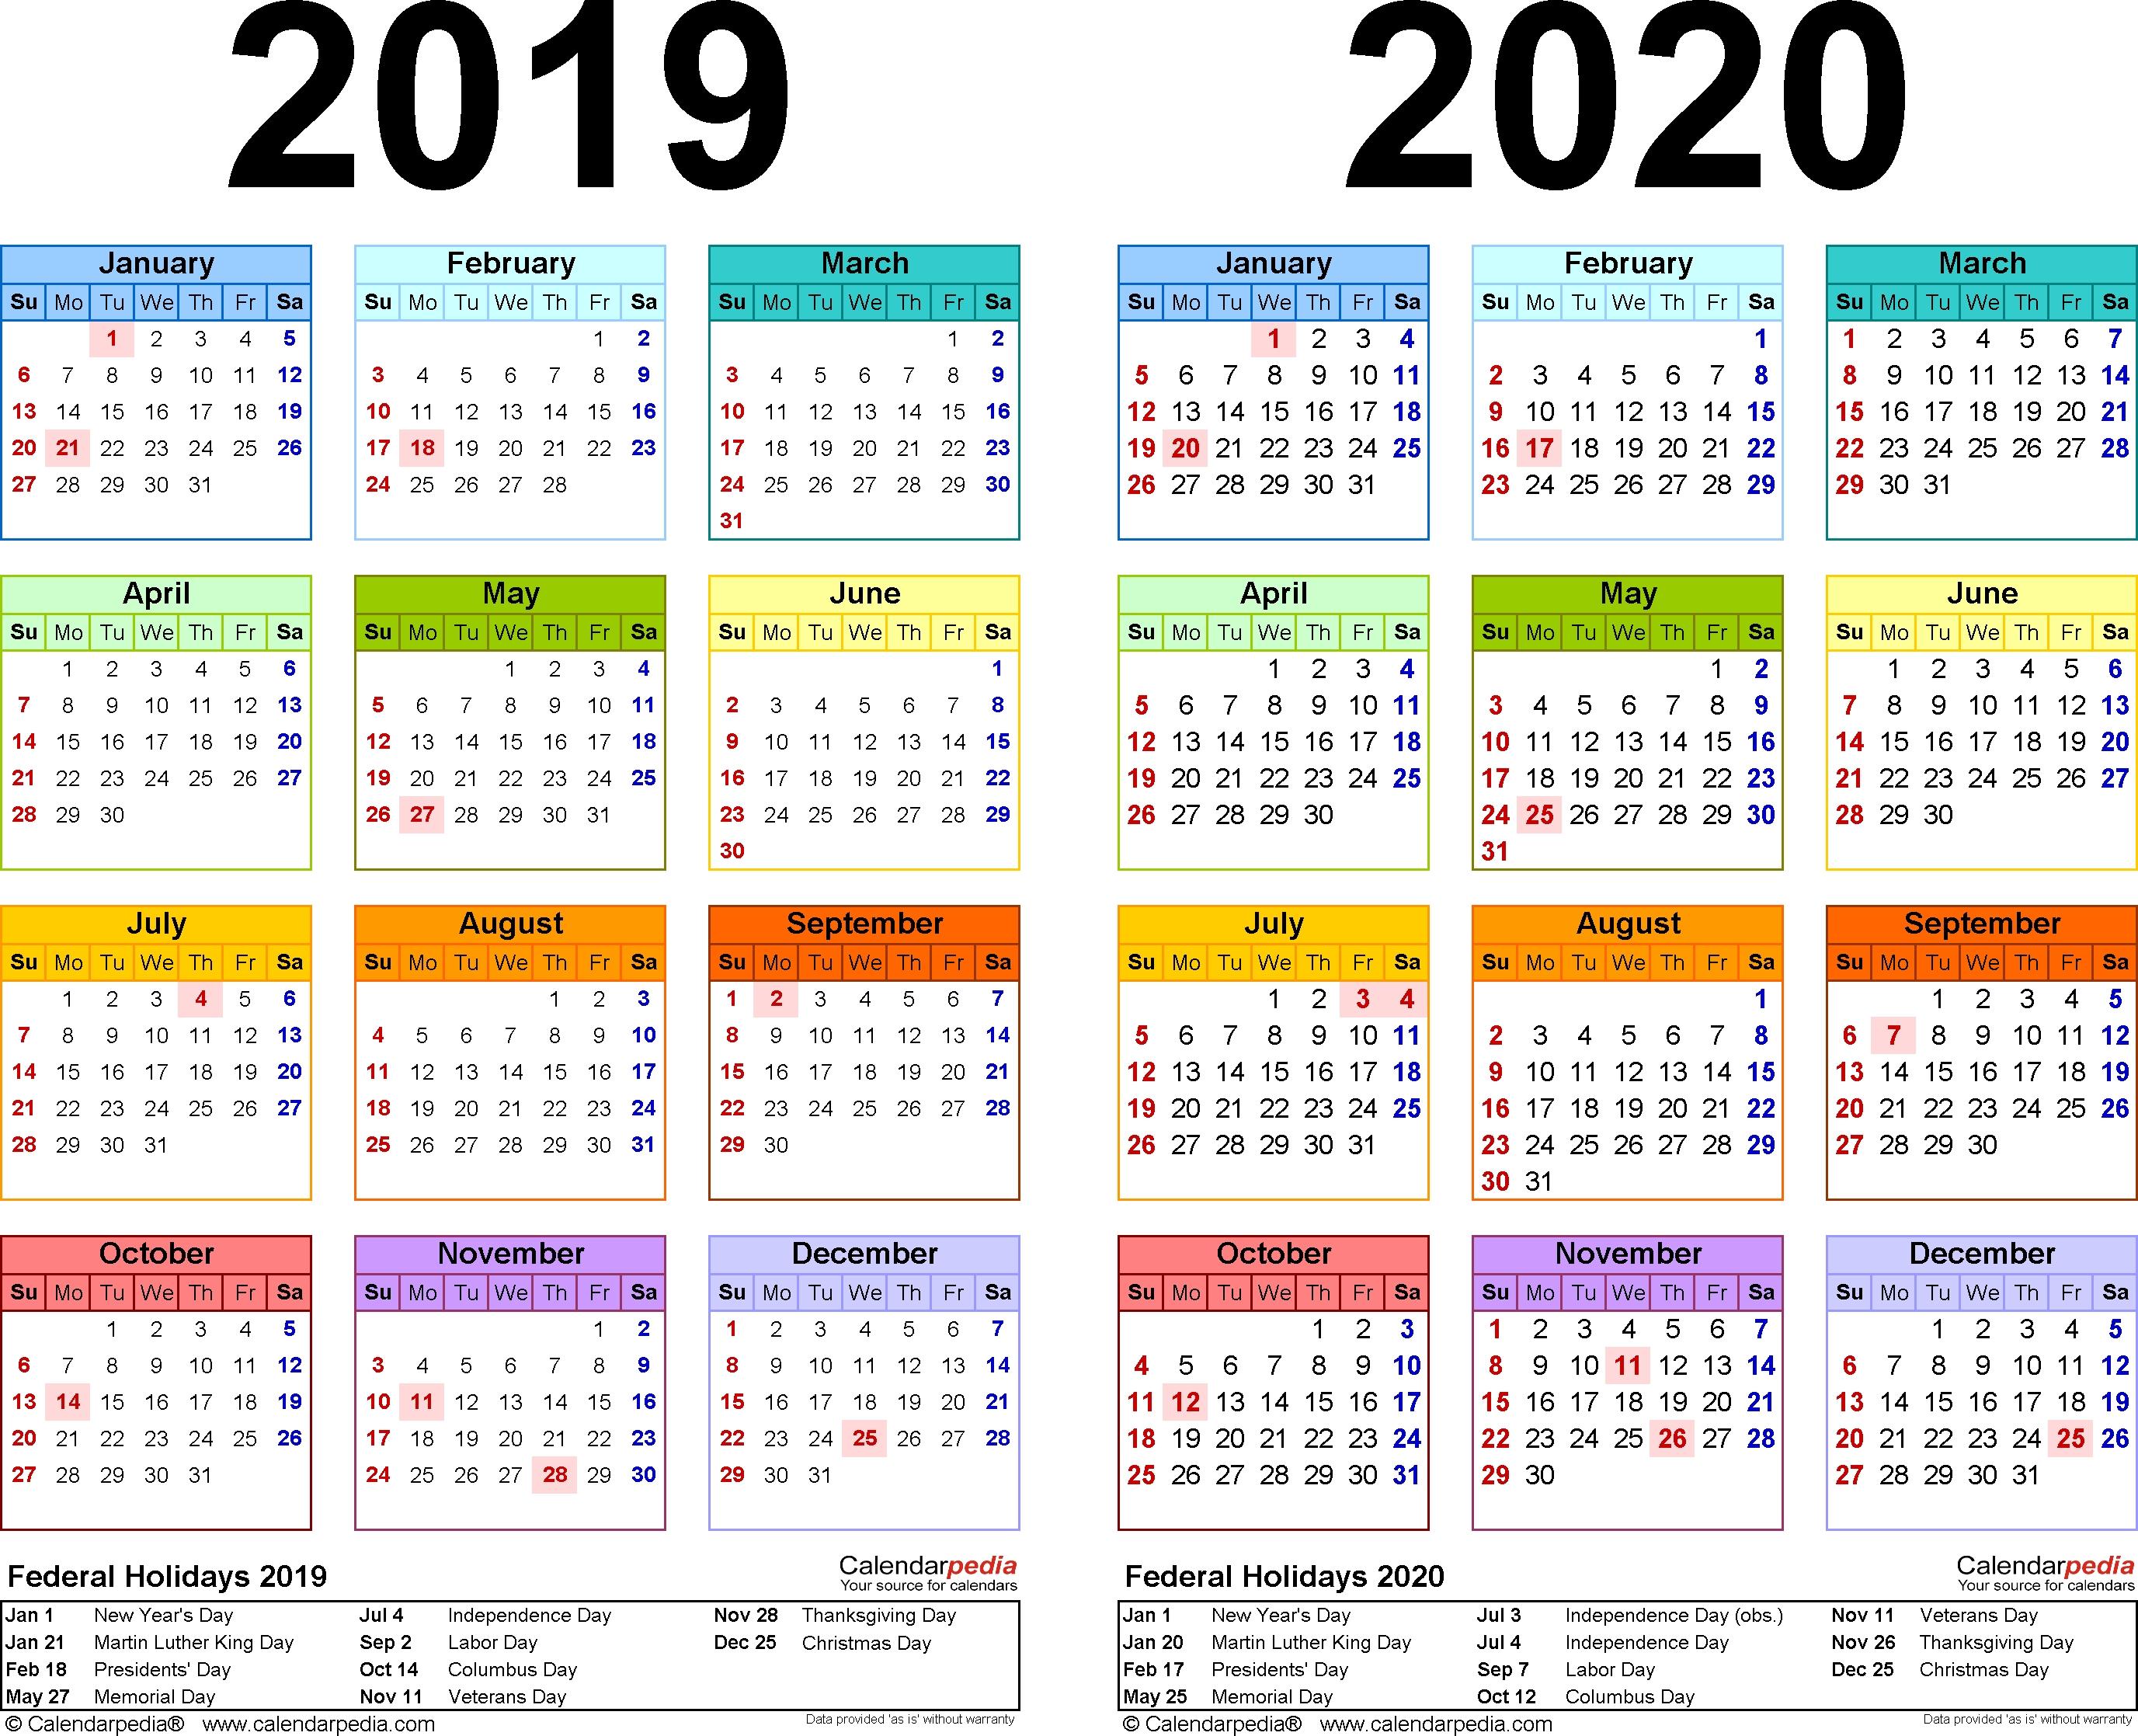 2019-2020 Calendar - Free Printable Two-Year Pdf Calendars regarding Year At A Glance Calendar 2019 2020